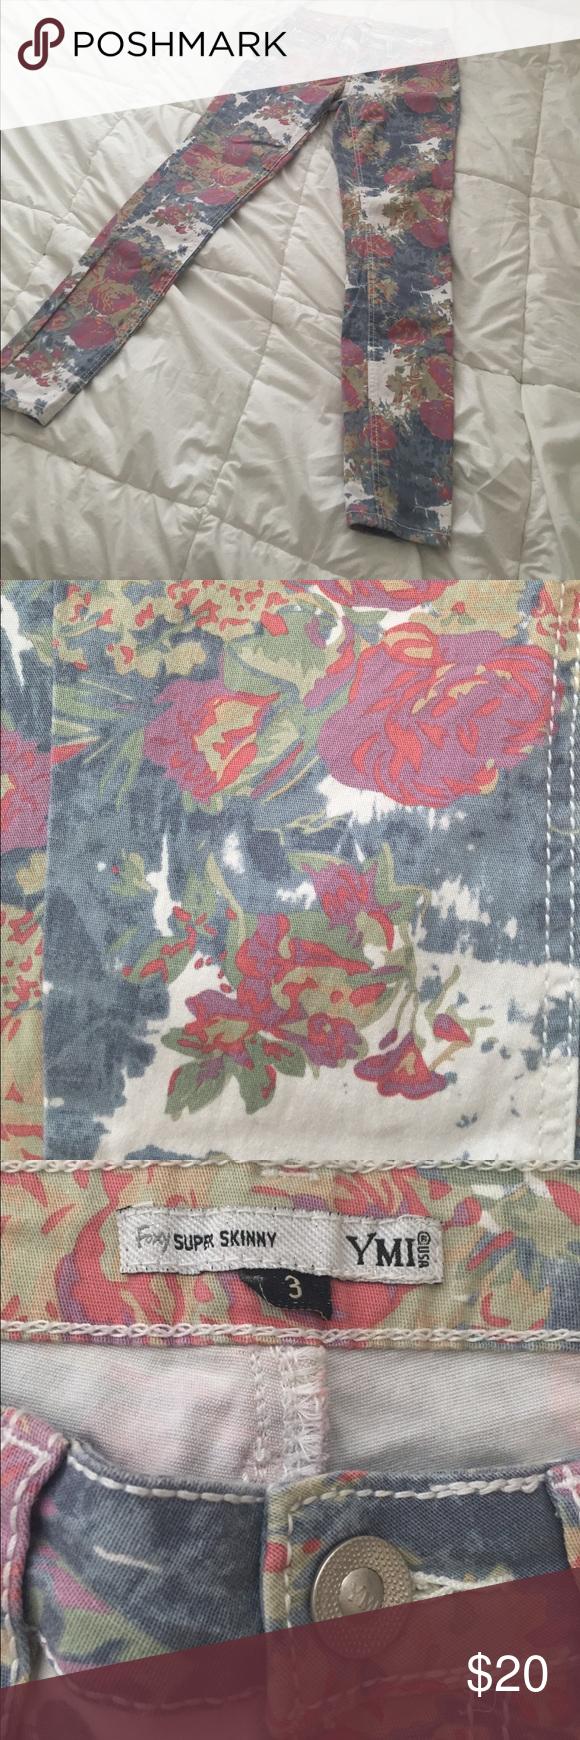 Floral skinny jeans Like new! YMI super skinny floral jeans! Perfect for summer! YMI Jeans Skinny